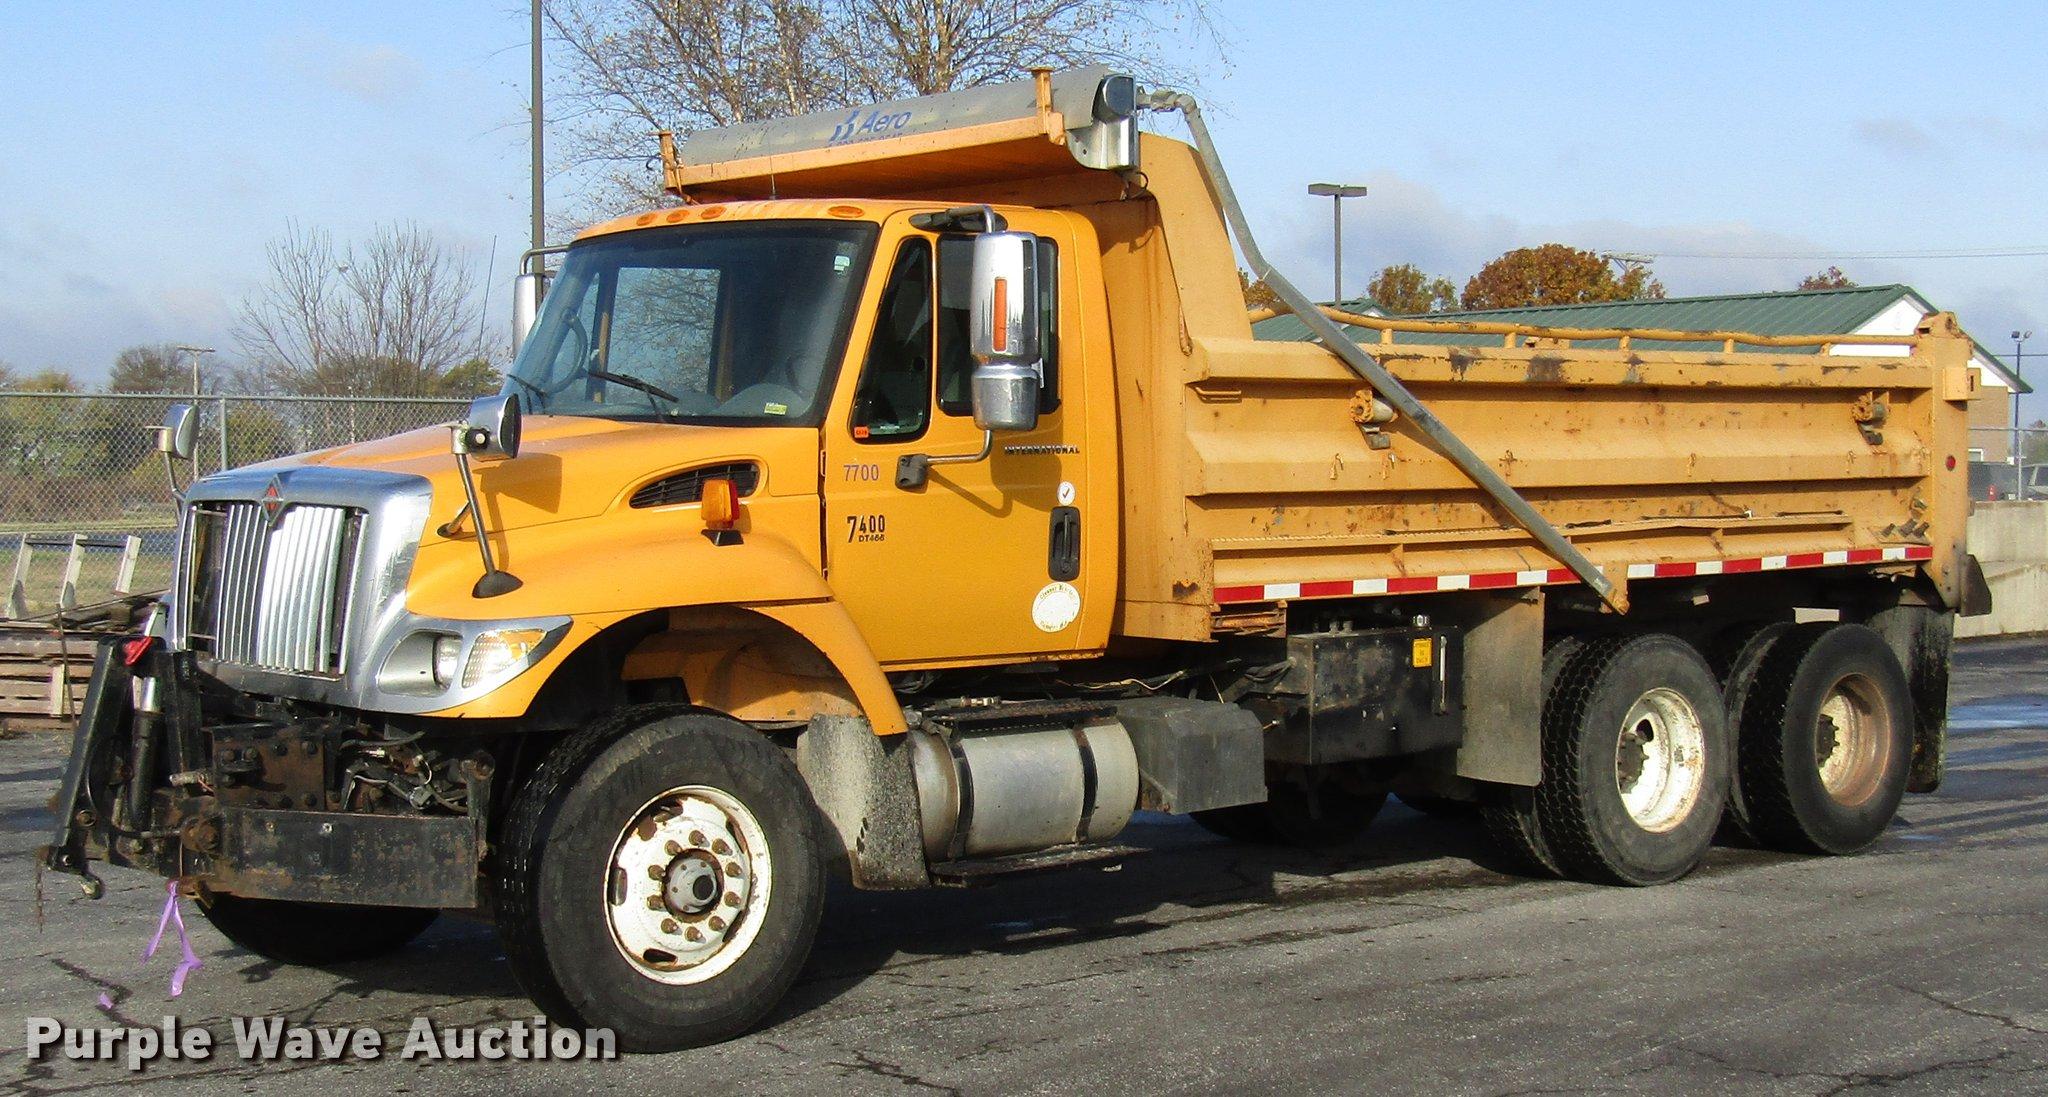 2006 International 7400 dump truck | Item DE5921 | SOLD! Dec